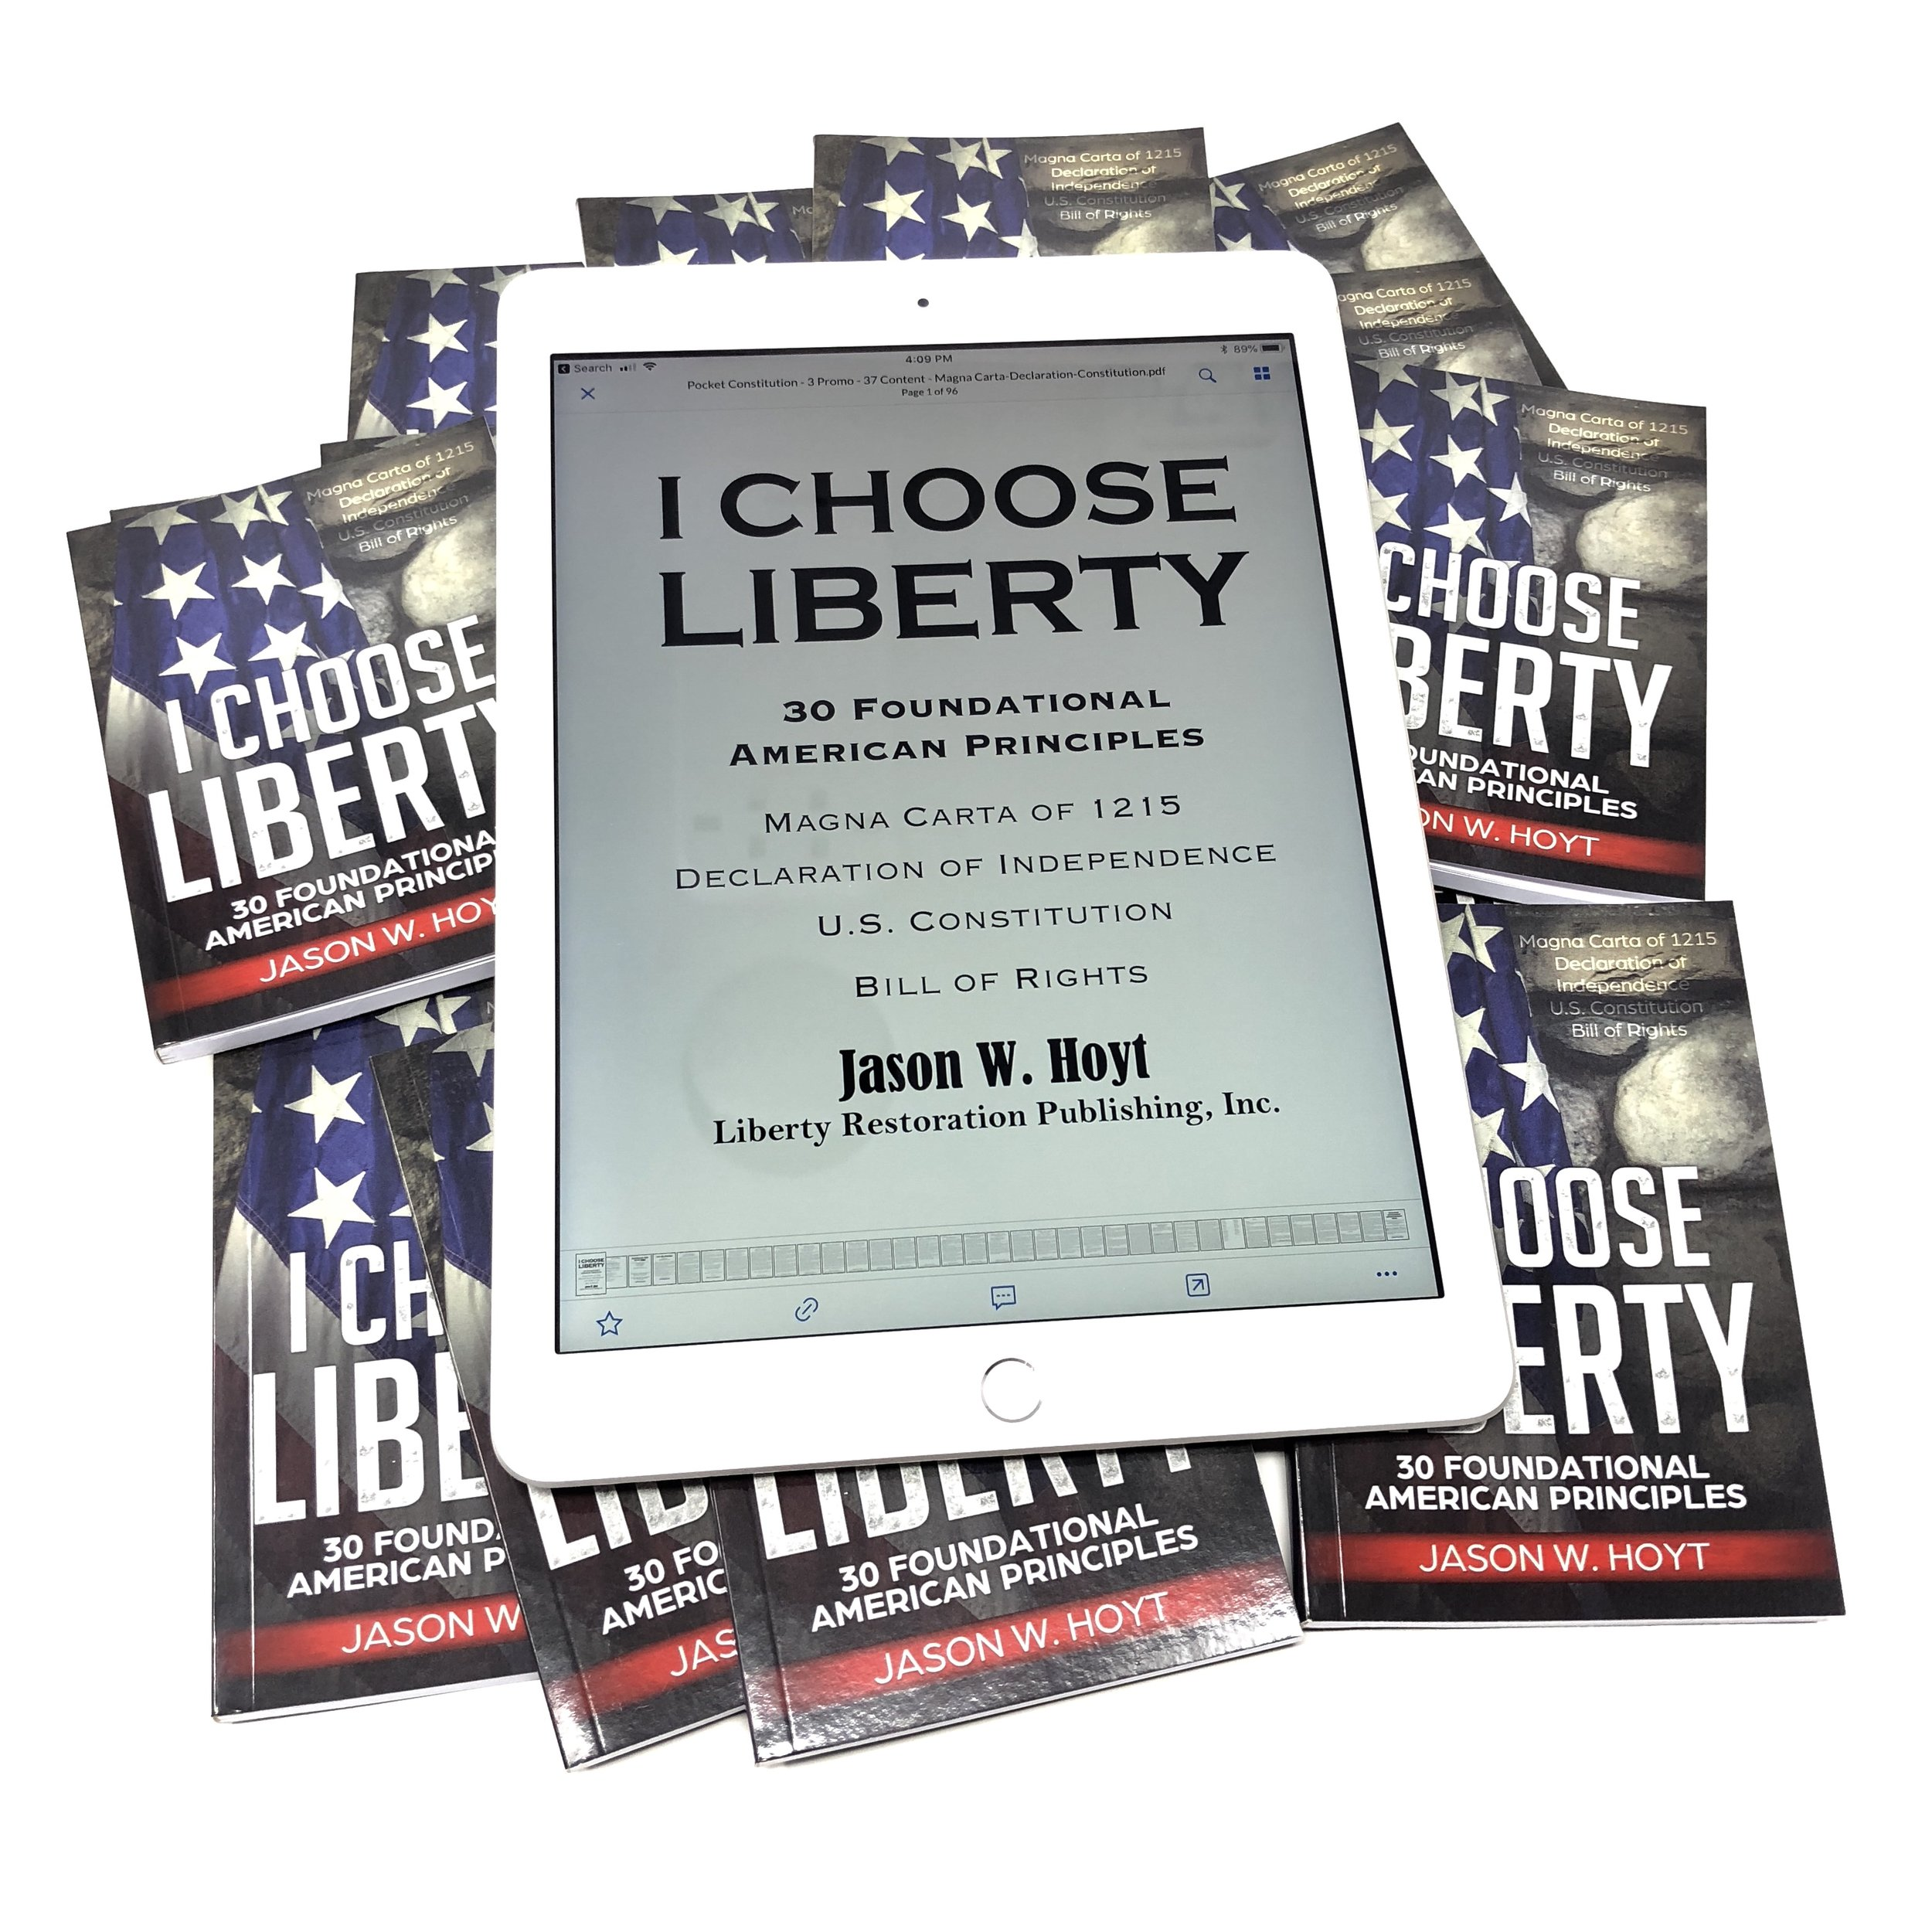 Jason W Hoyt I Choose Liberty Pocket Constitution - Ebook ipad 1.jpg